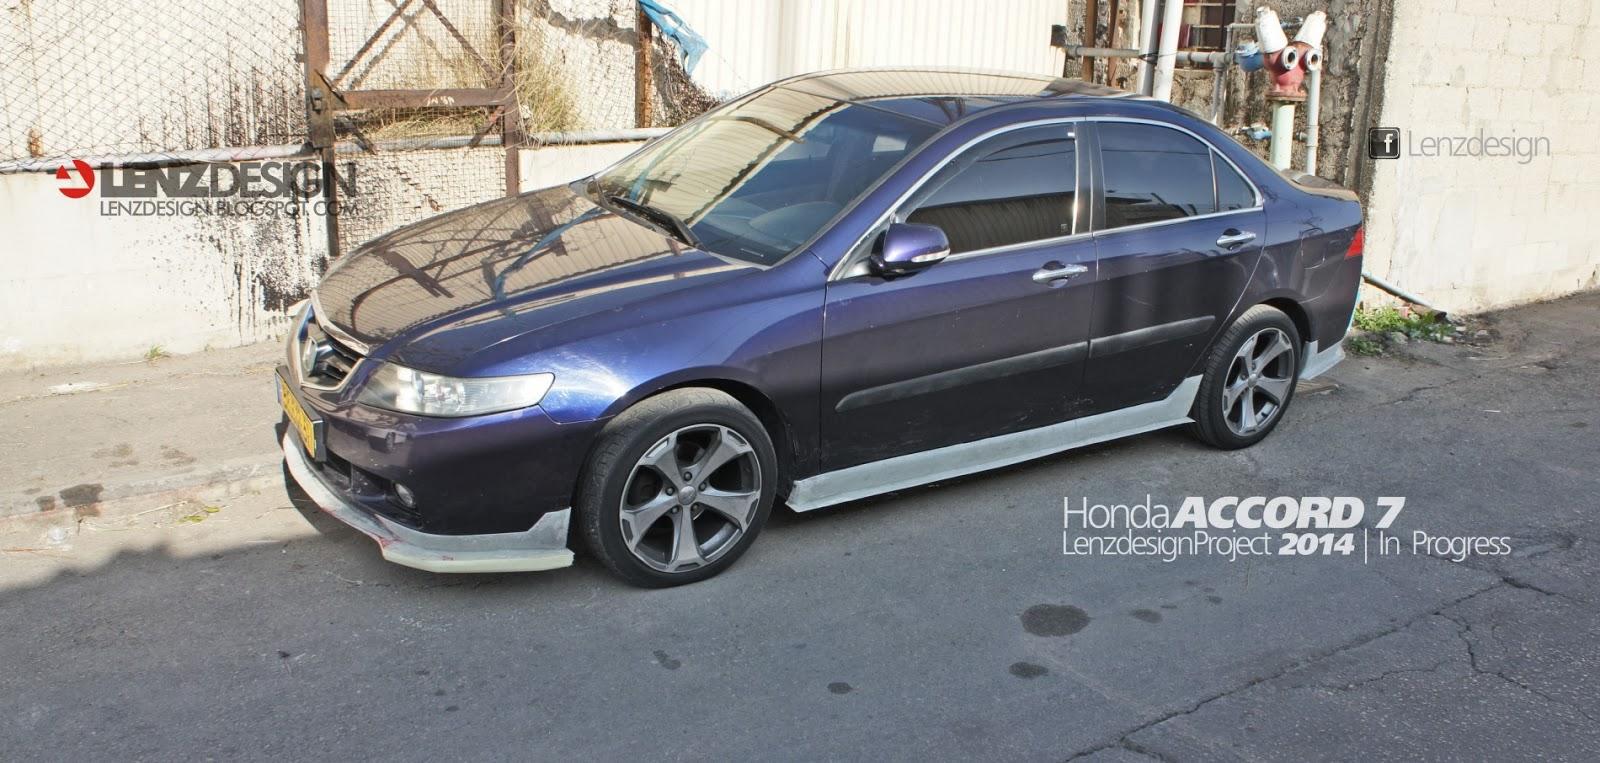 Honda Accord 7 Tuning Lenzdesign Performance - Auto Cars Benz